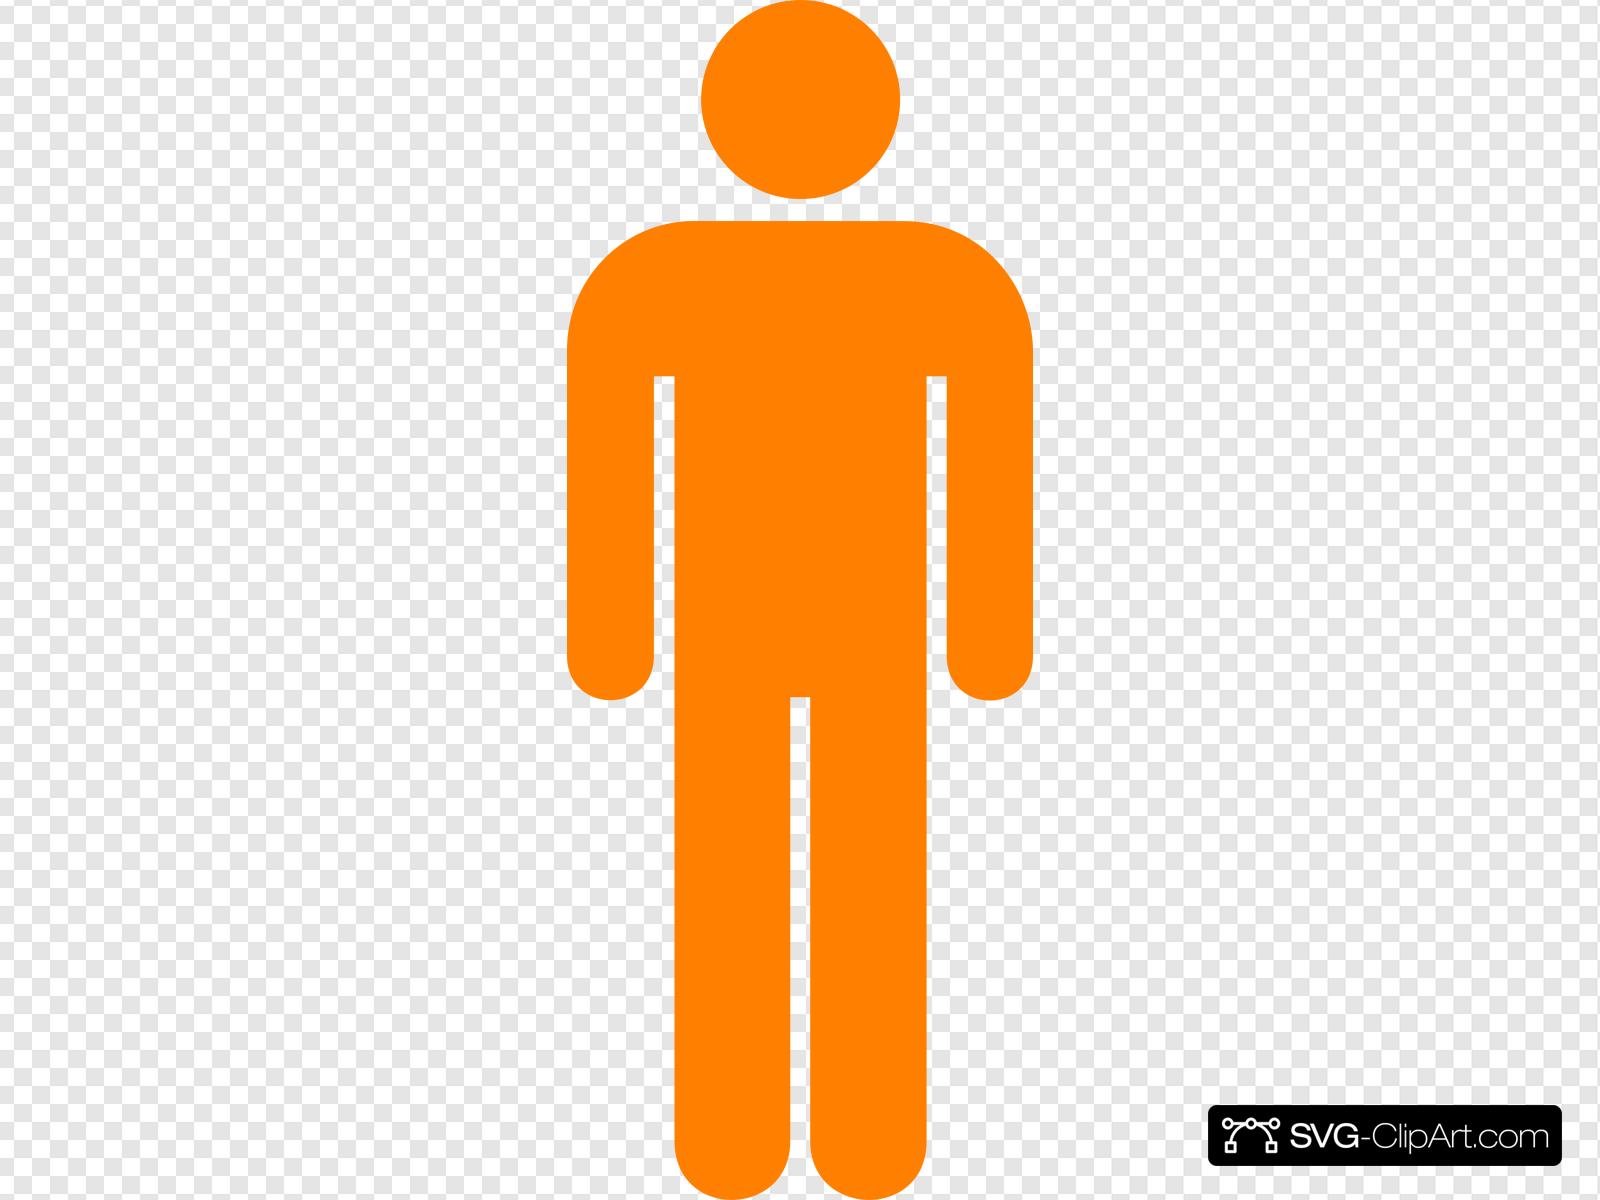 Orange Man Md Clip art, Icon and SVG.